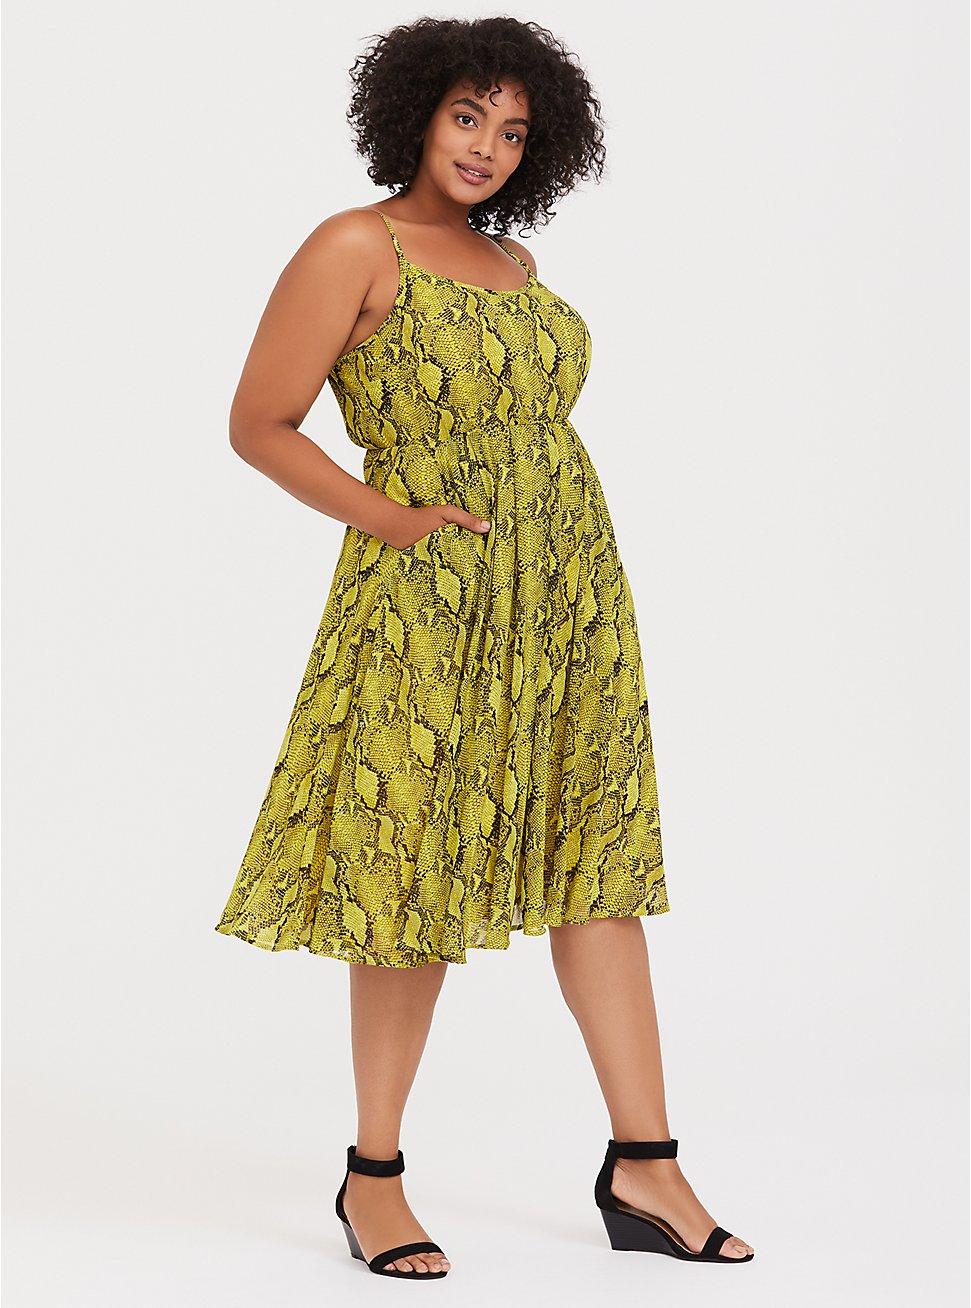 Neon Yellow Snakeskin Print Chiffon Midi Dress, ANIMAL - YELLOW, hi-res